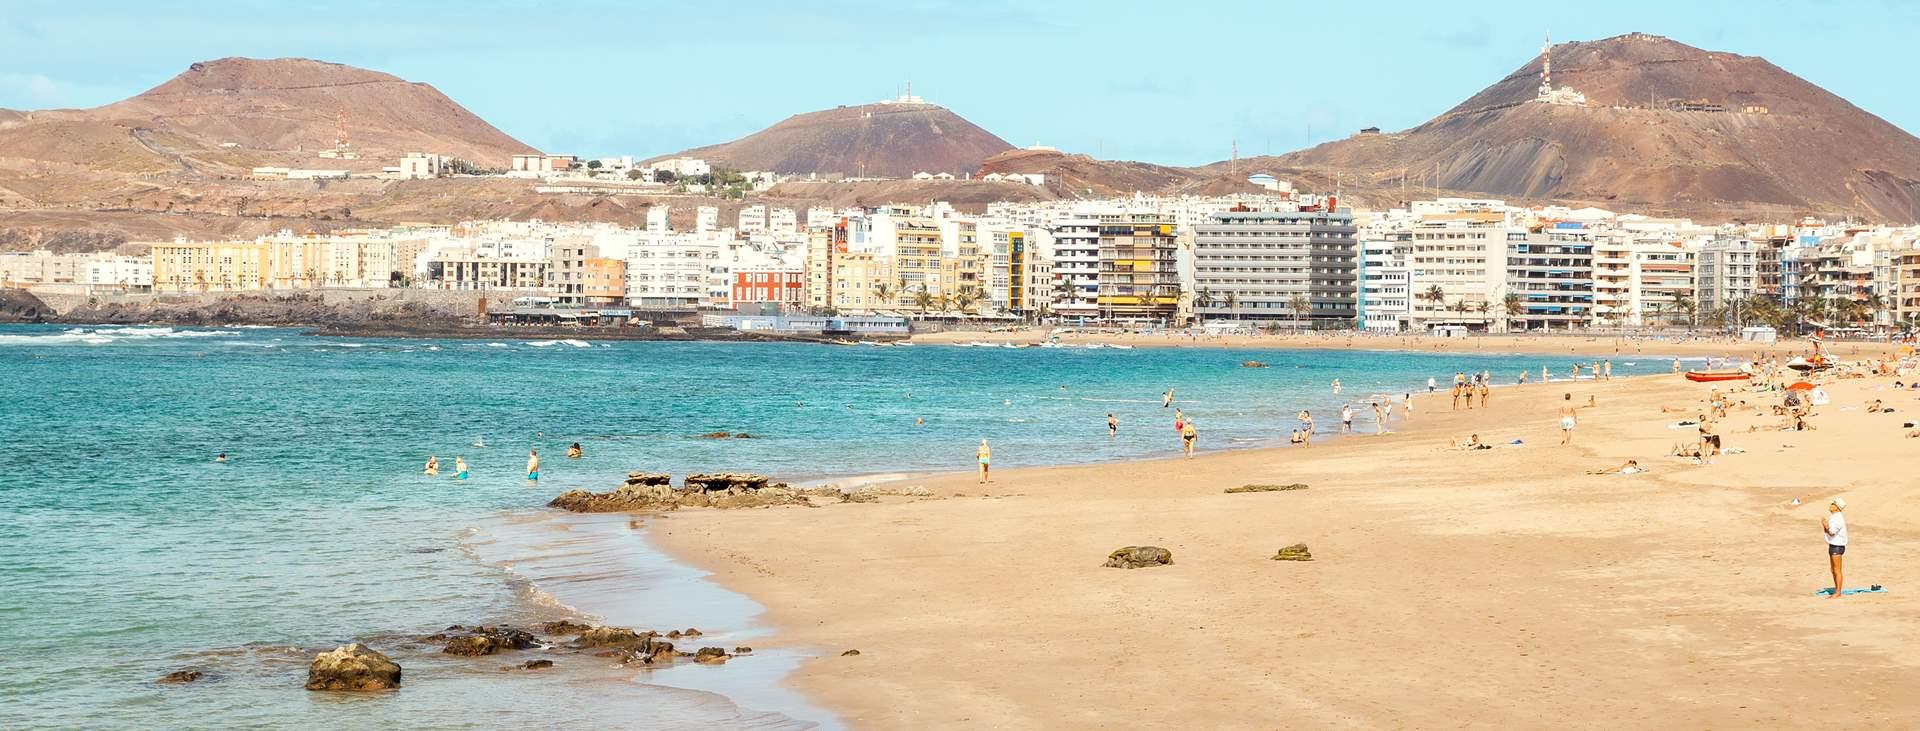 Hotellit Las Palmas Gran Canaria Espanja Tjareborg